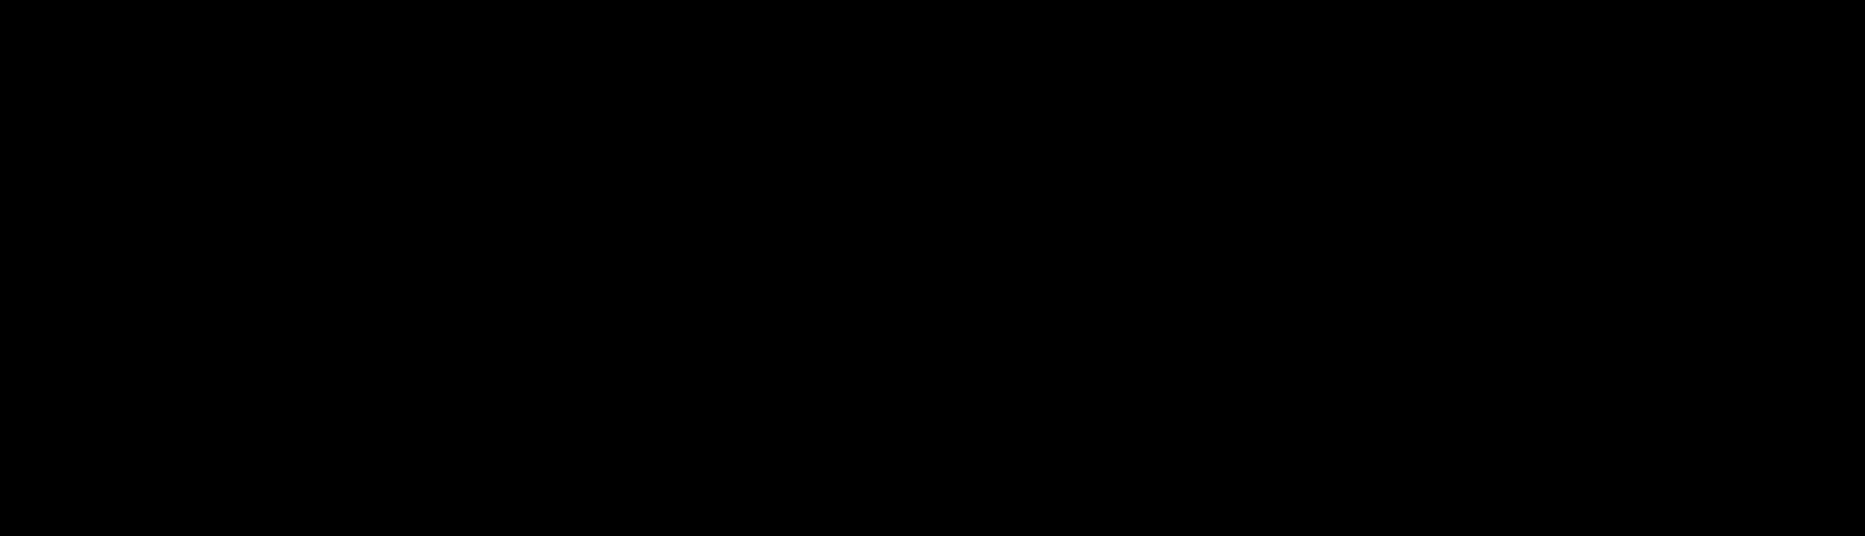 Phenol is heated with zinc dust